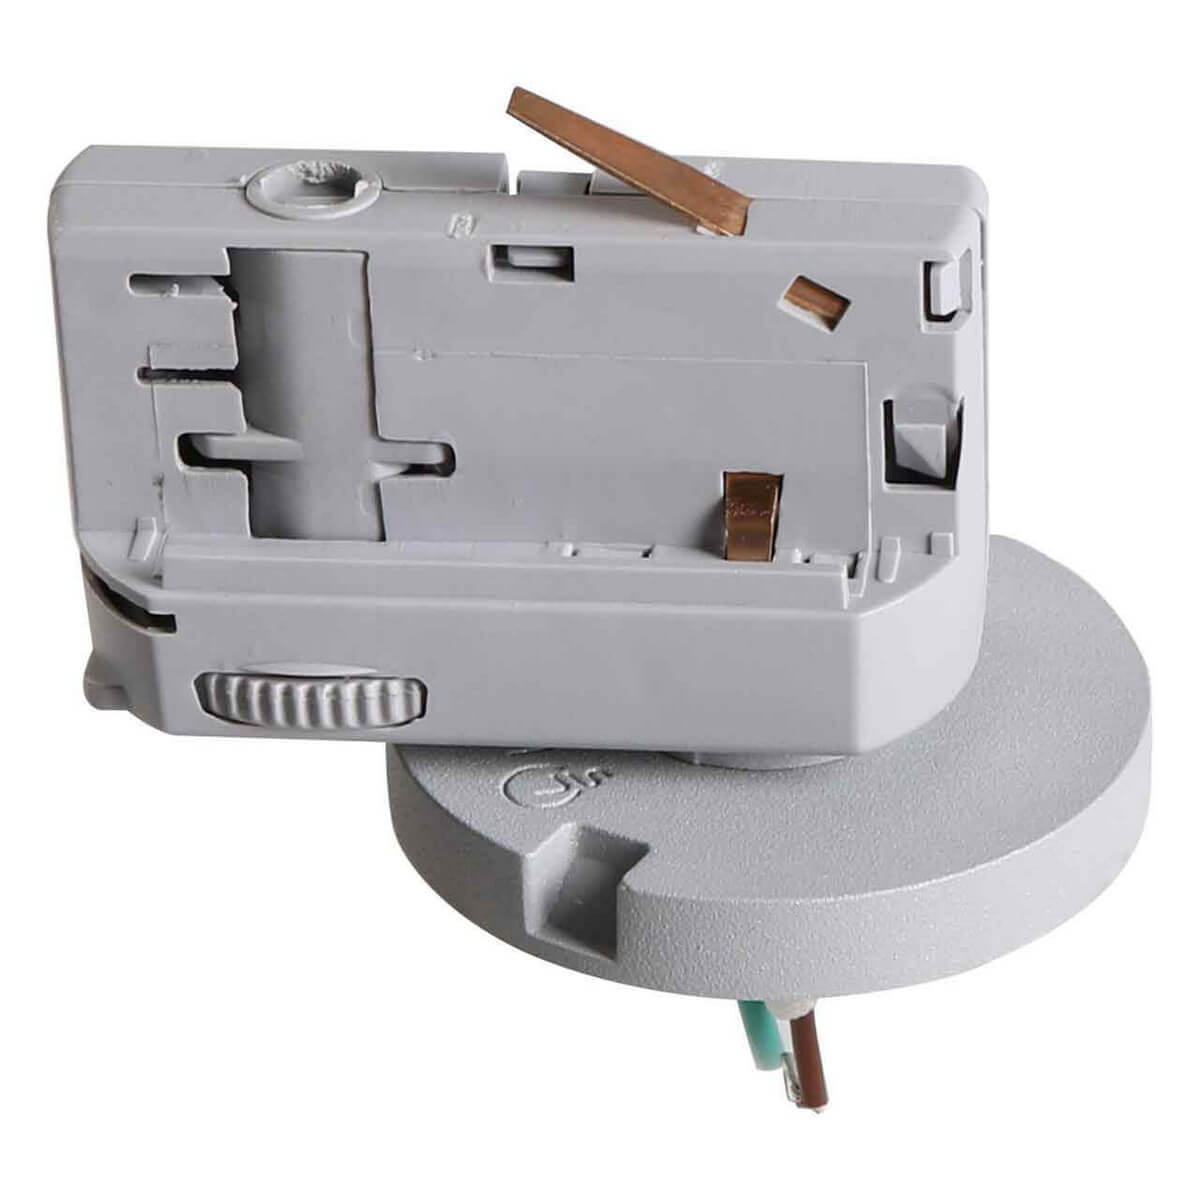 Адаптер для шинопровода Lightstar 594079 Asta Gray (для трехфазного шинопровода)